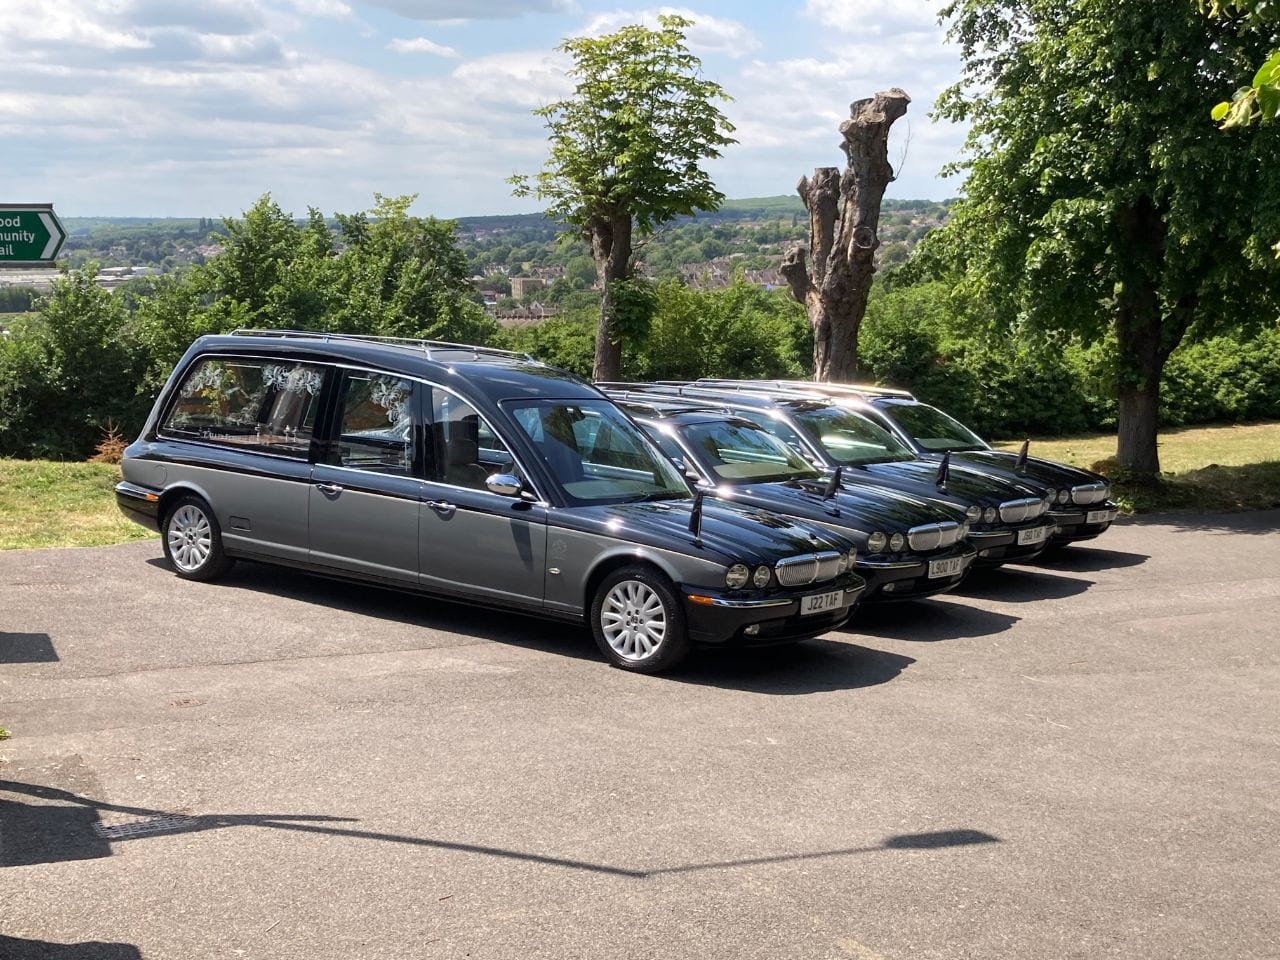 Terry Allen Funeral Cars